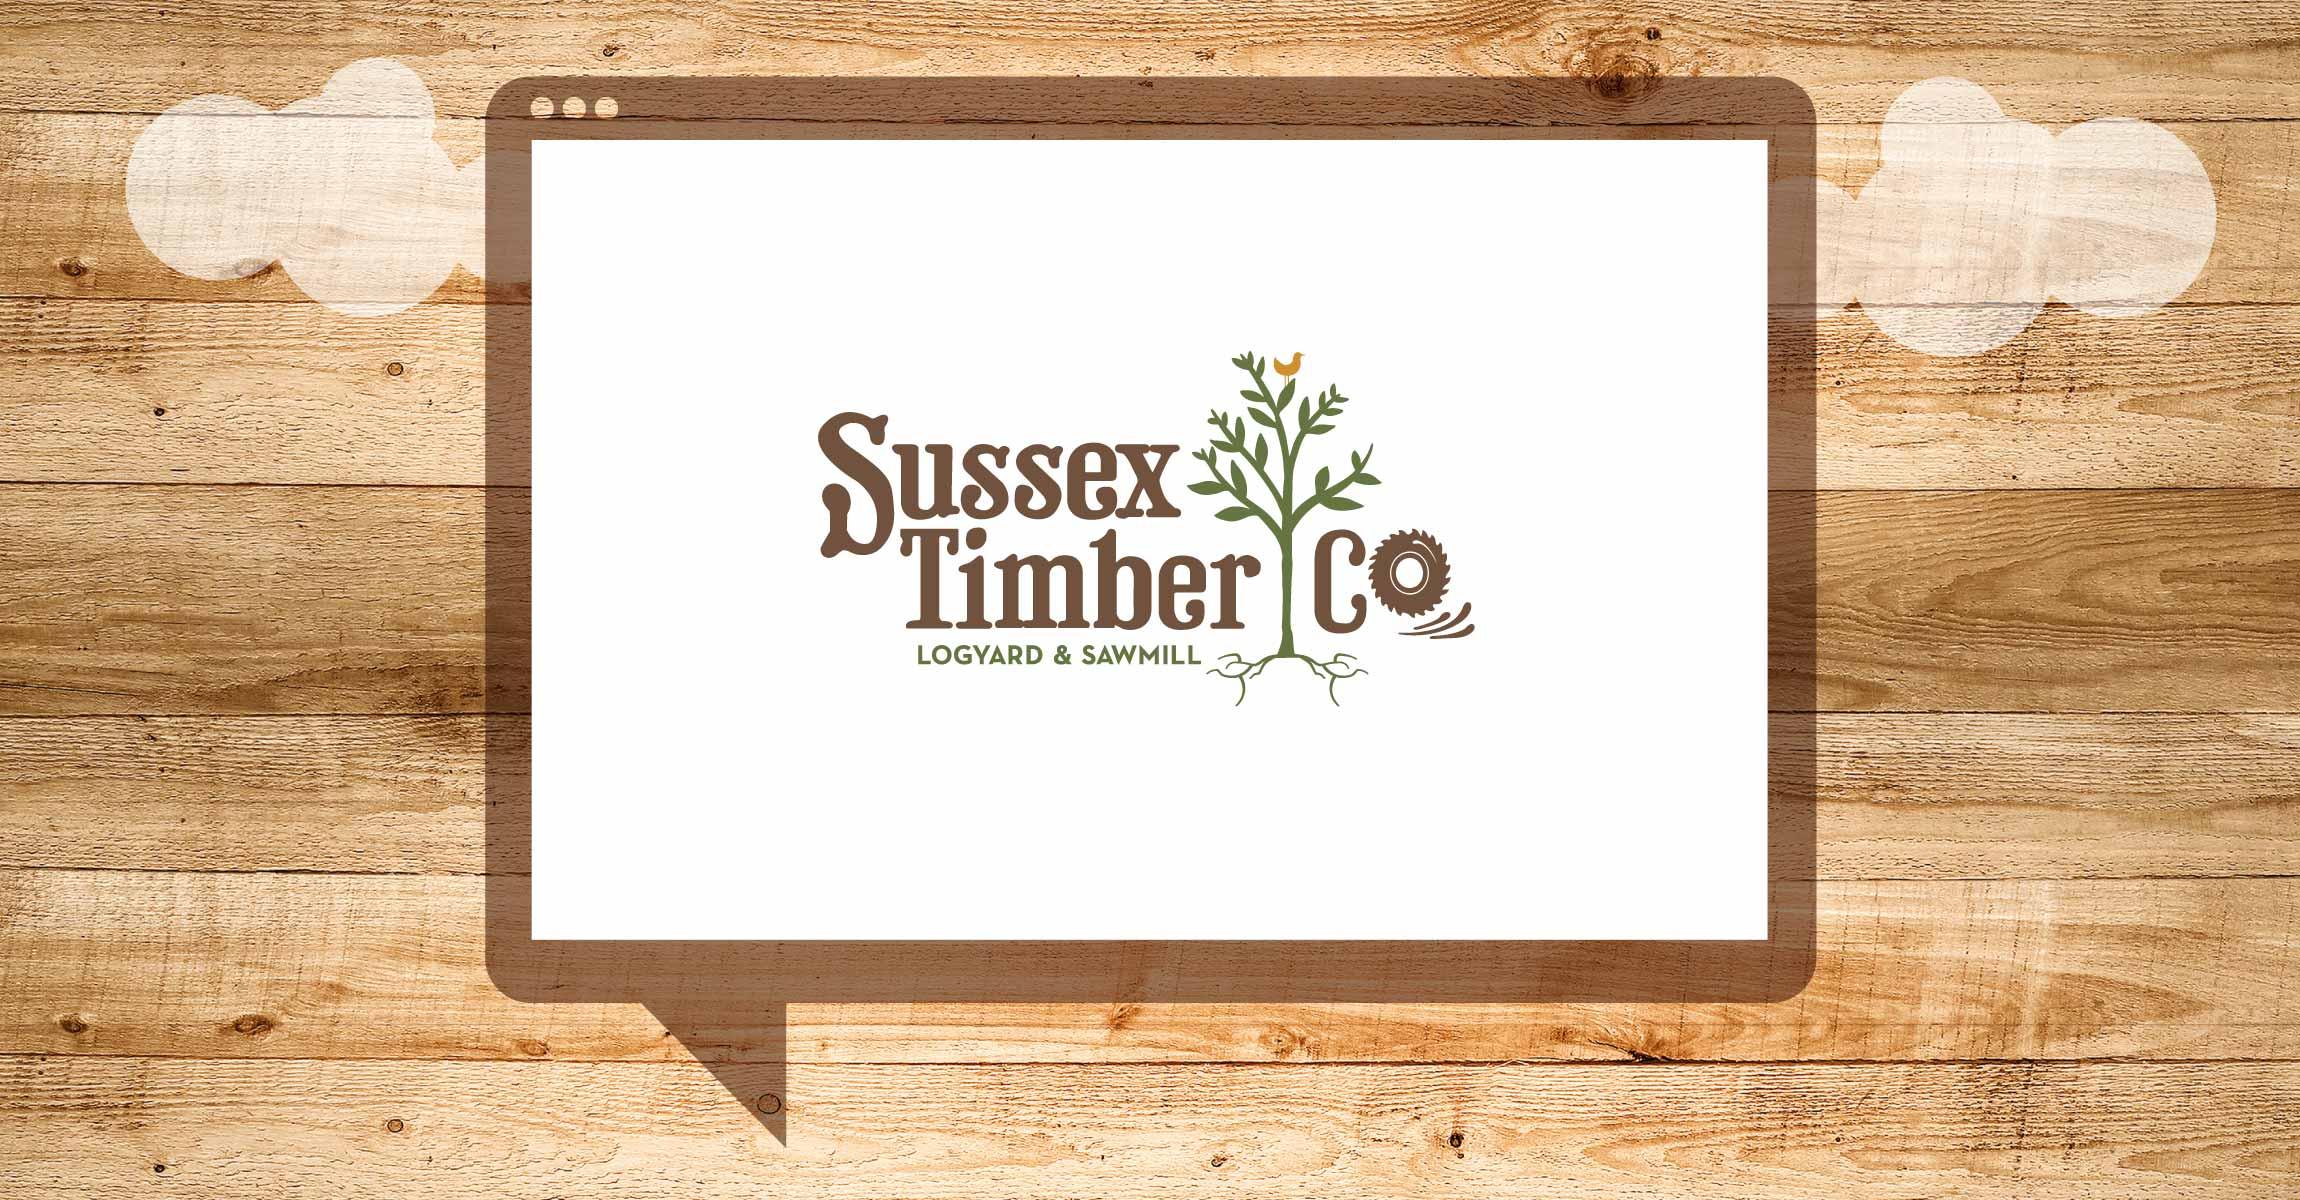 Sussex-Timber-Co-Sawmill-Logyard-Company-Branding-2